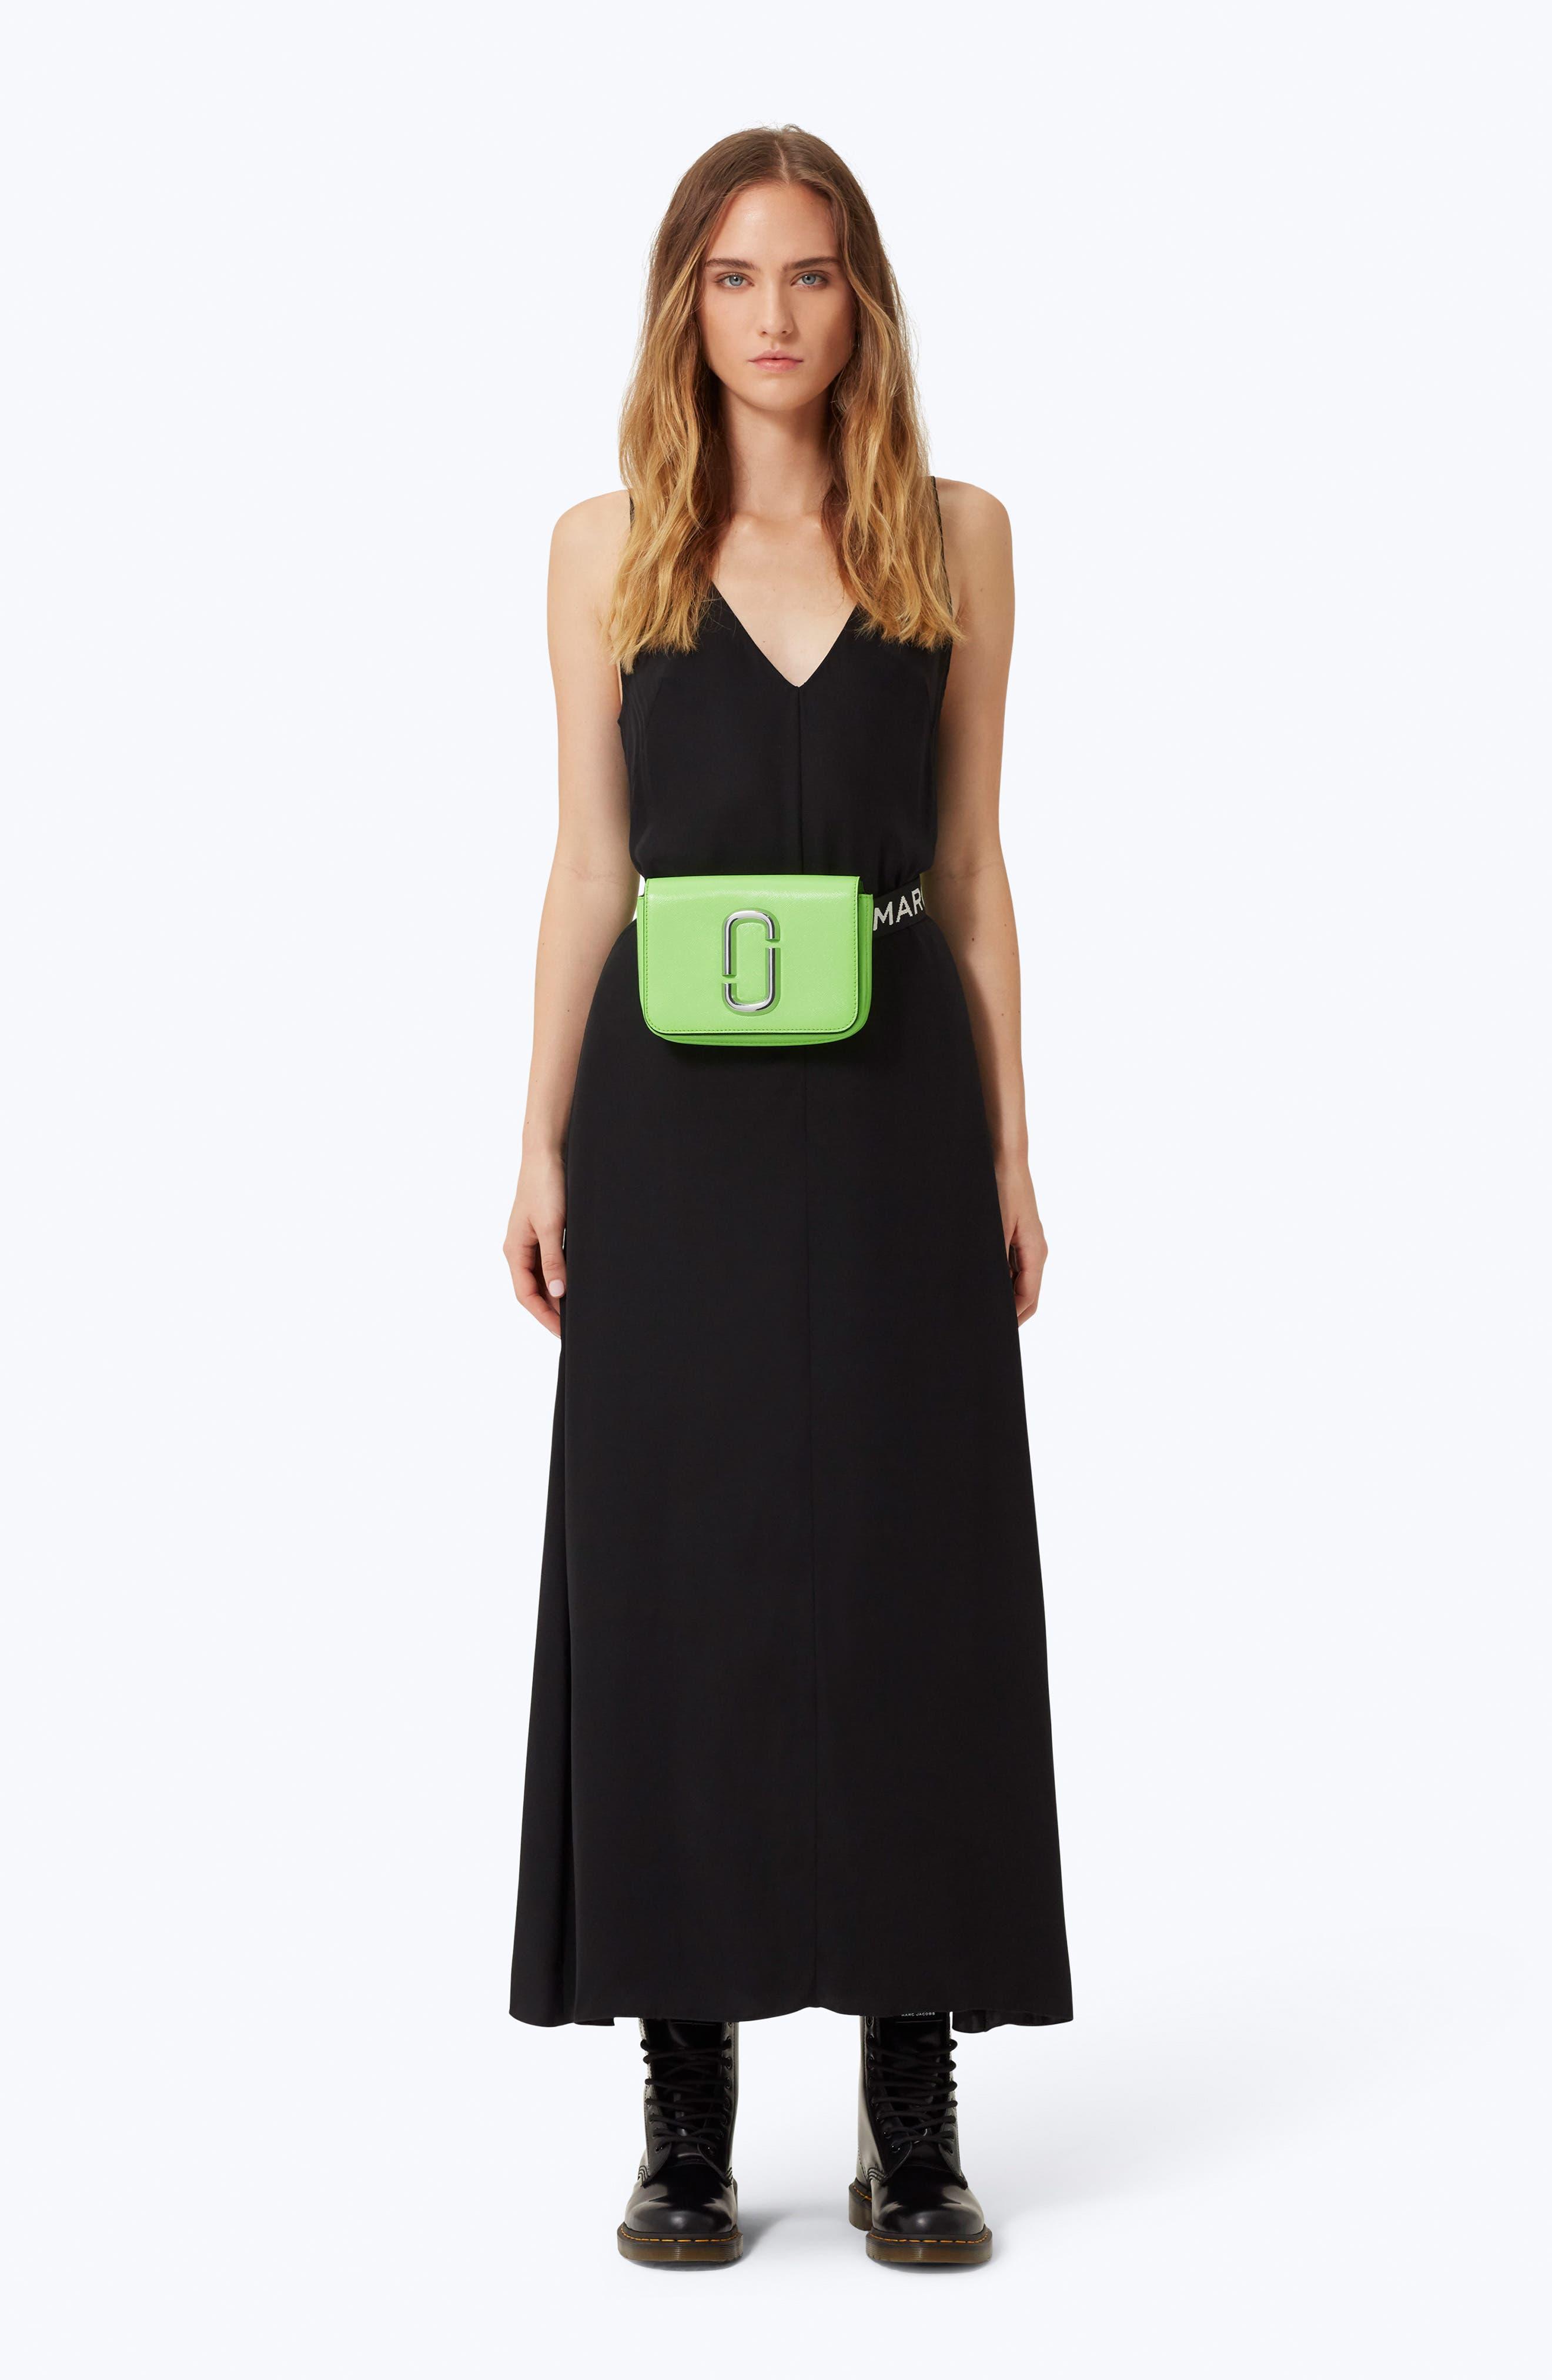 Hip Shot Convertible Crossbody Bag - Green in Bright Green